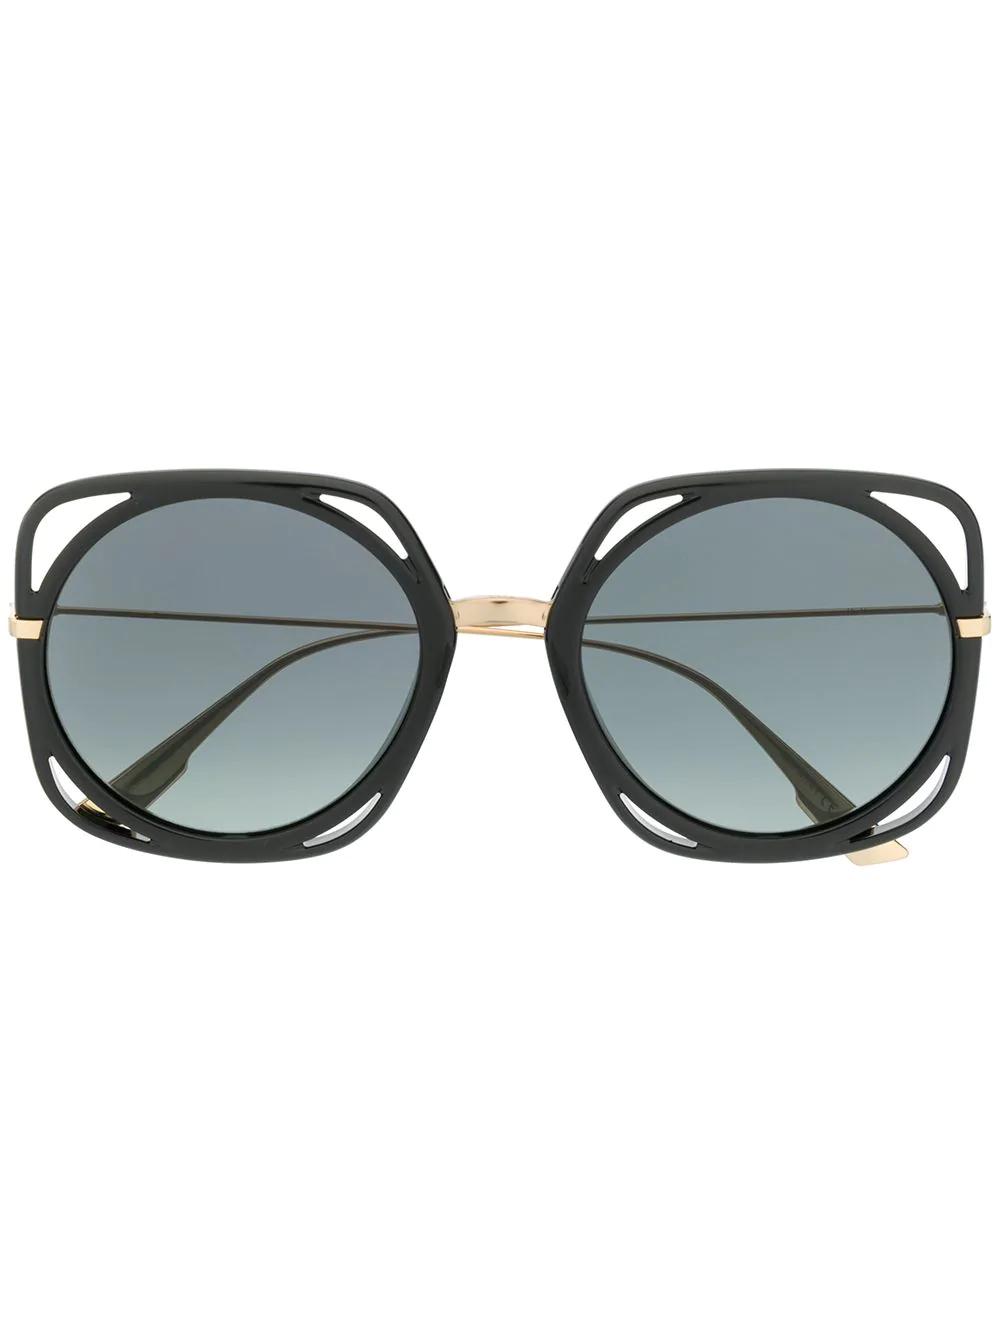 Dior Eyewear 692лв